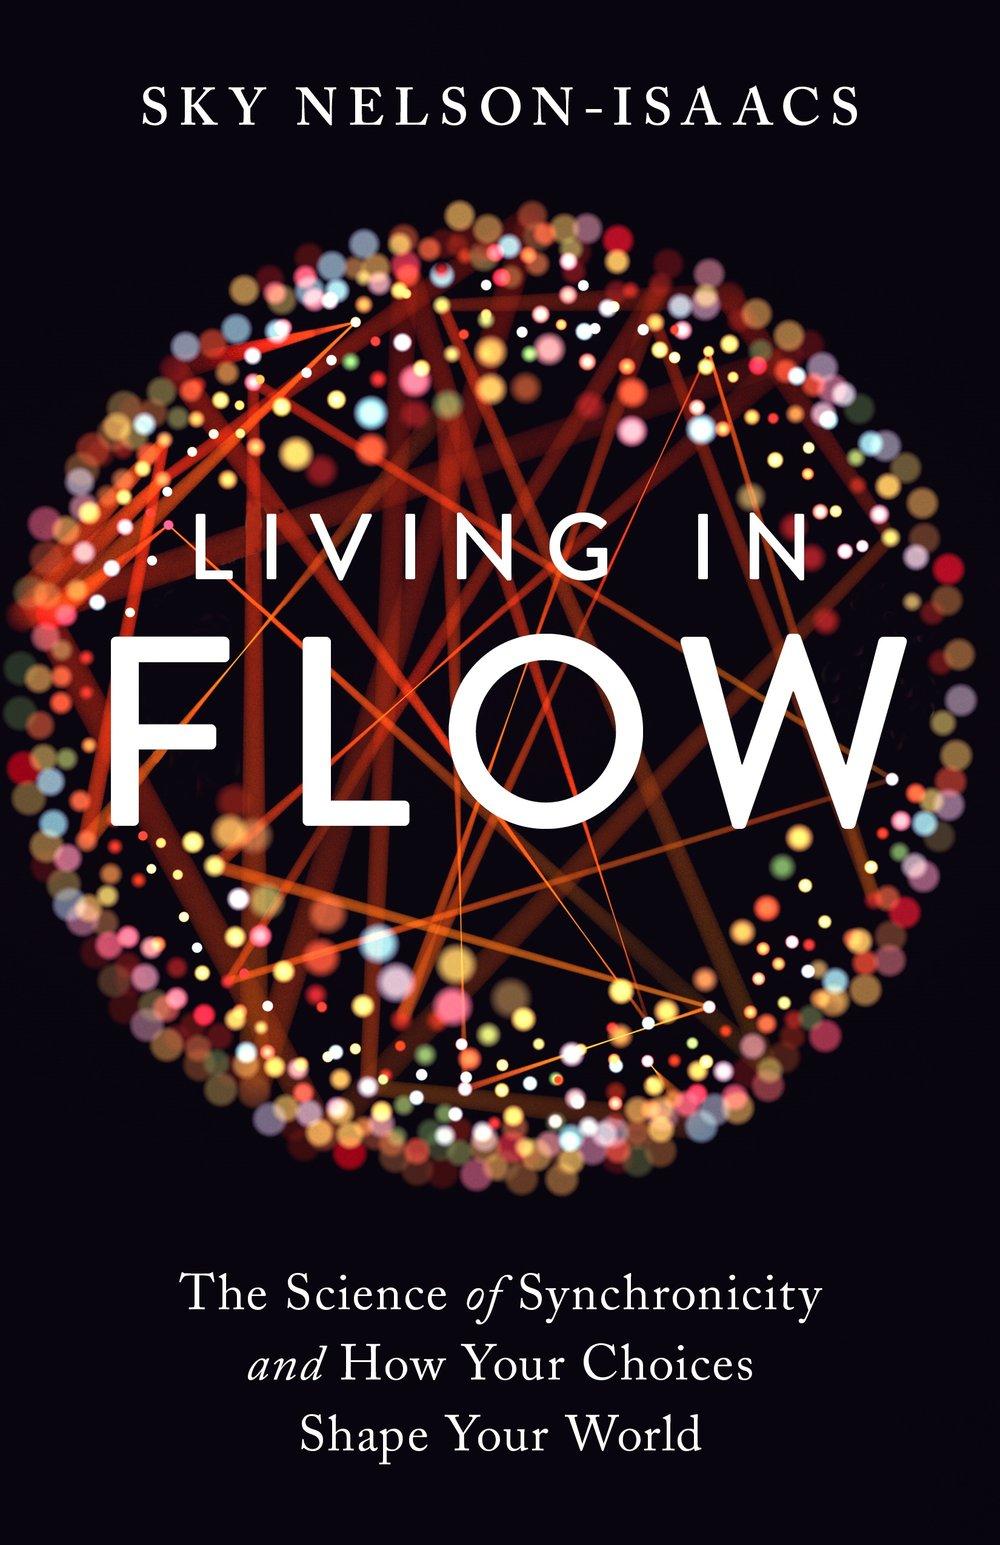 LivingInFlow-SkyNelsonIsaacs-FinalCover.jpg